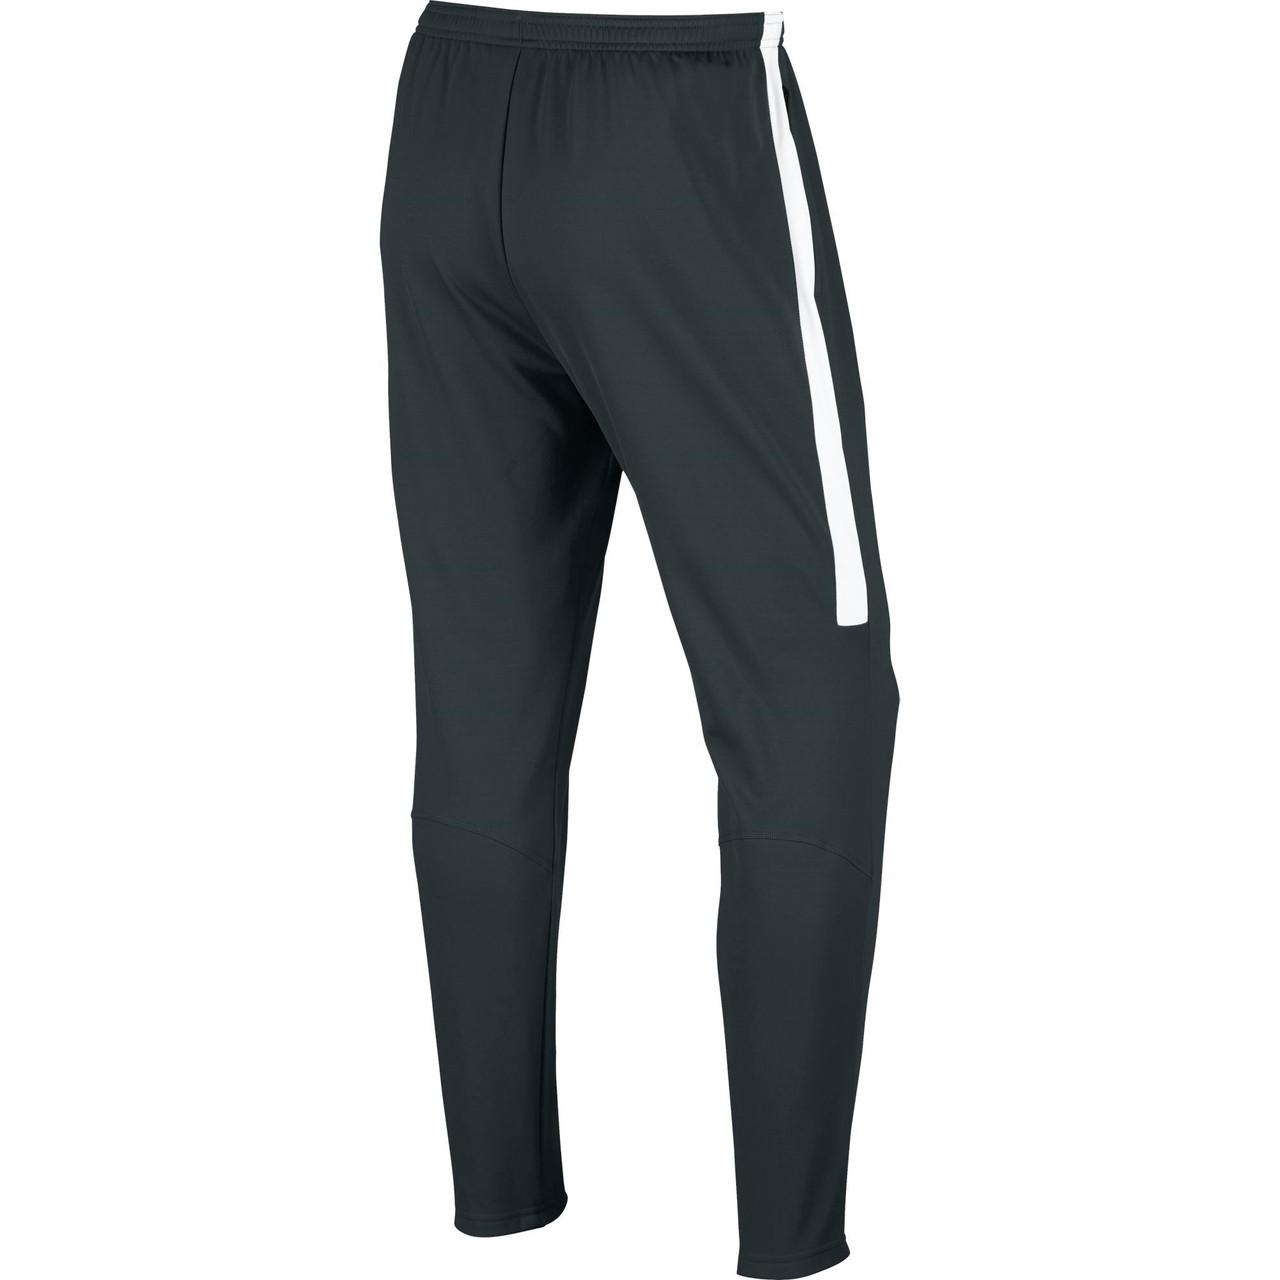 Hermanos vena Aventurarse  Nike Dry Academy Pants - Graphite/White SD (021020) - ohp soccer